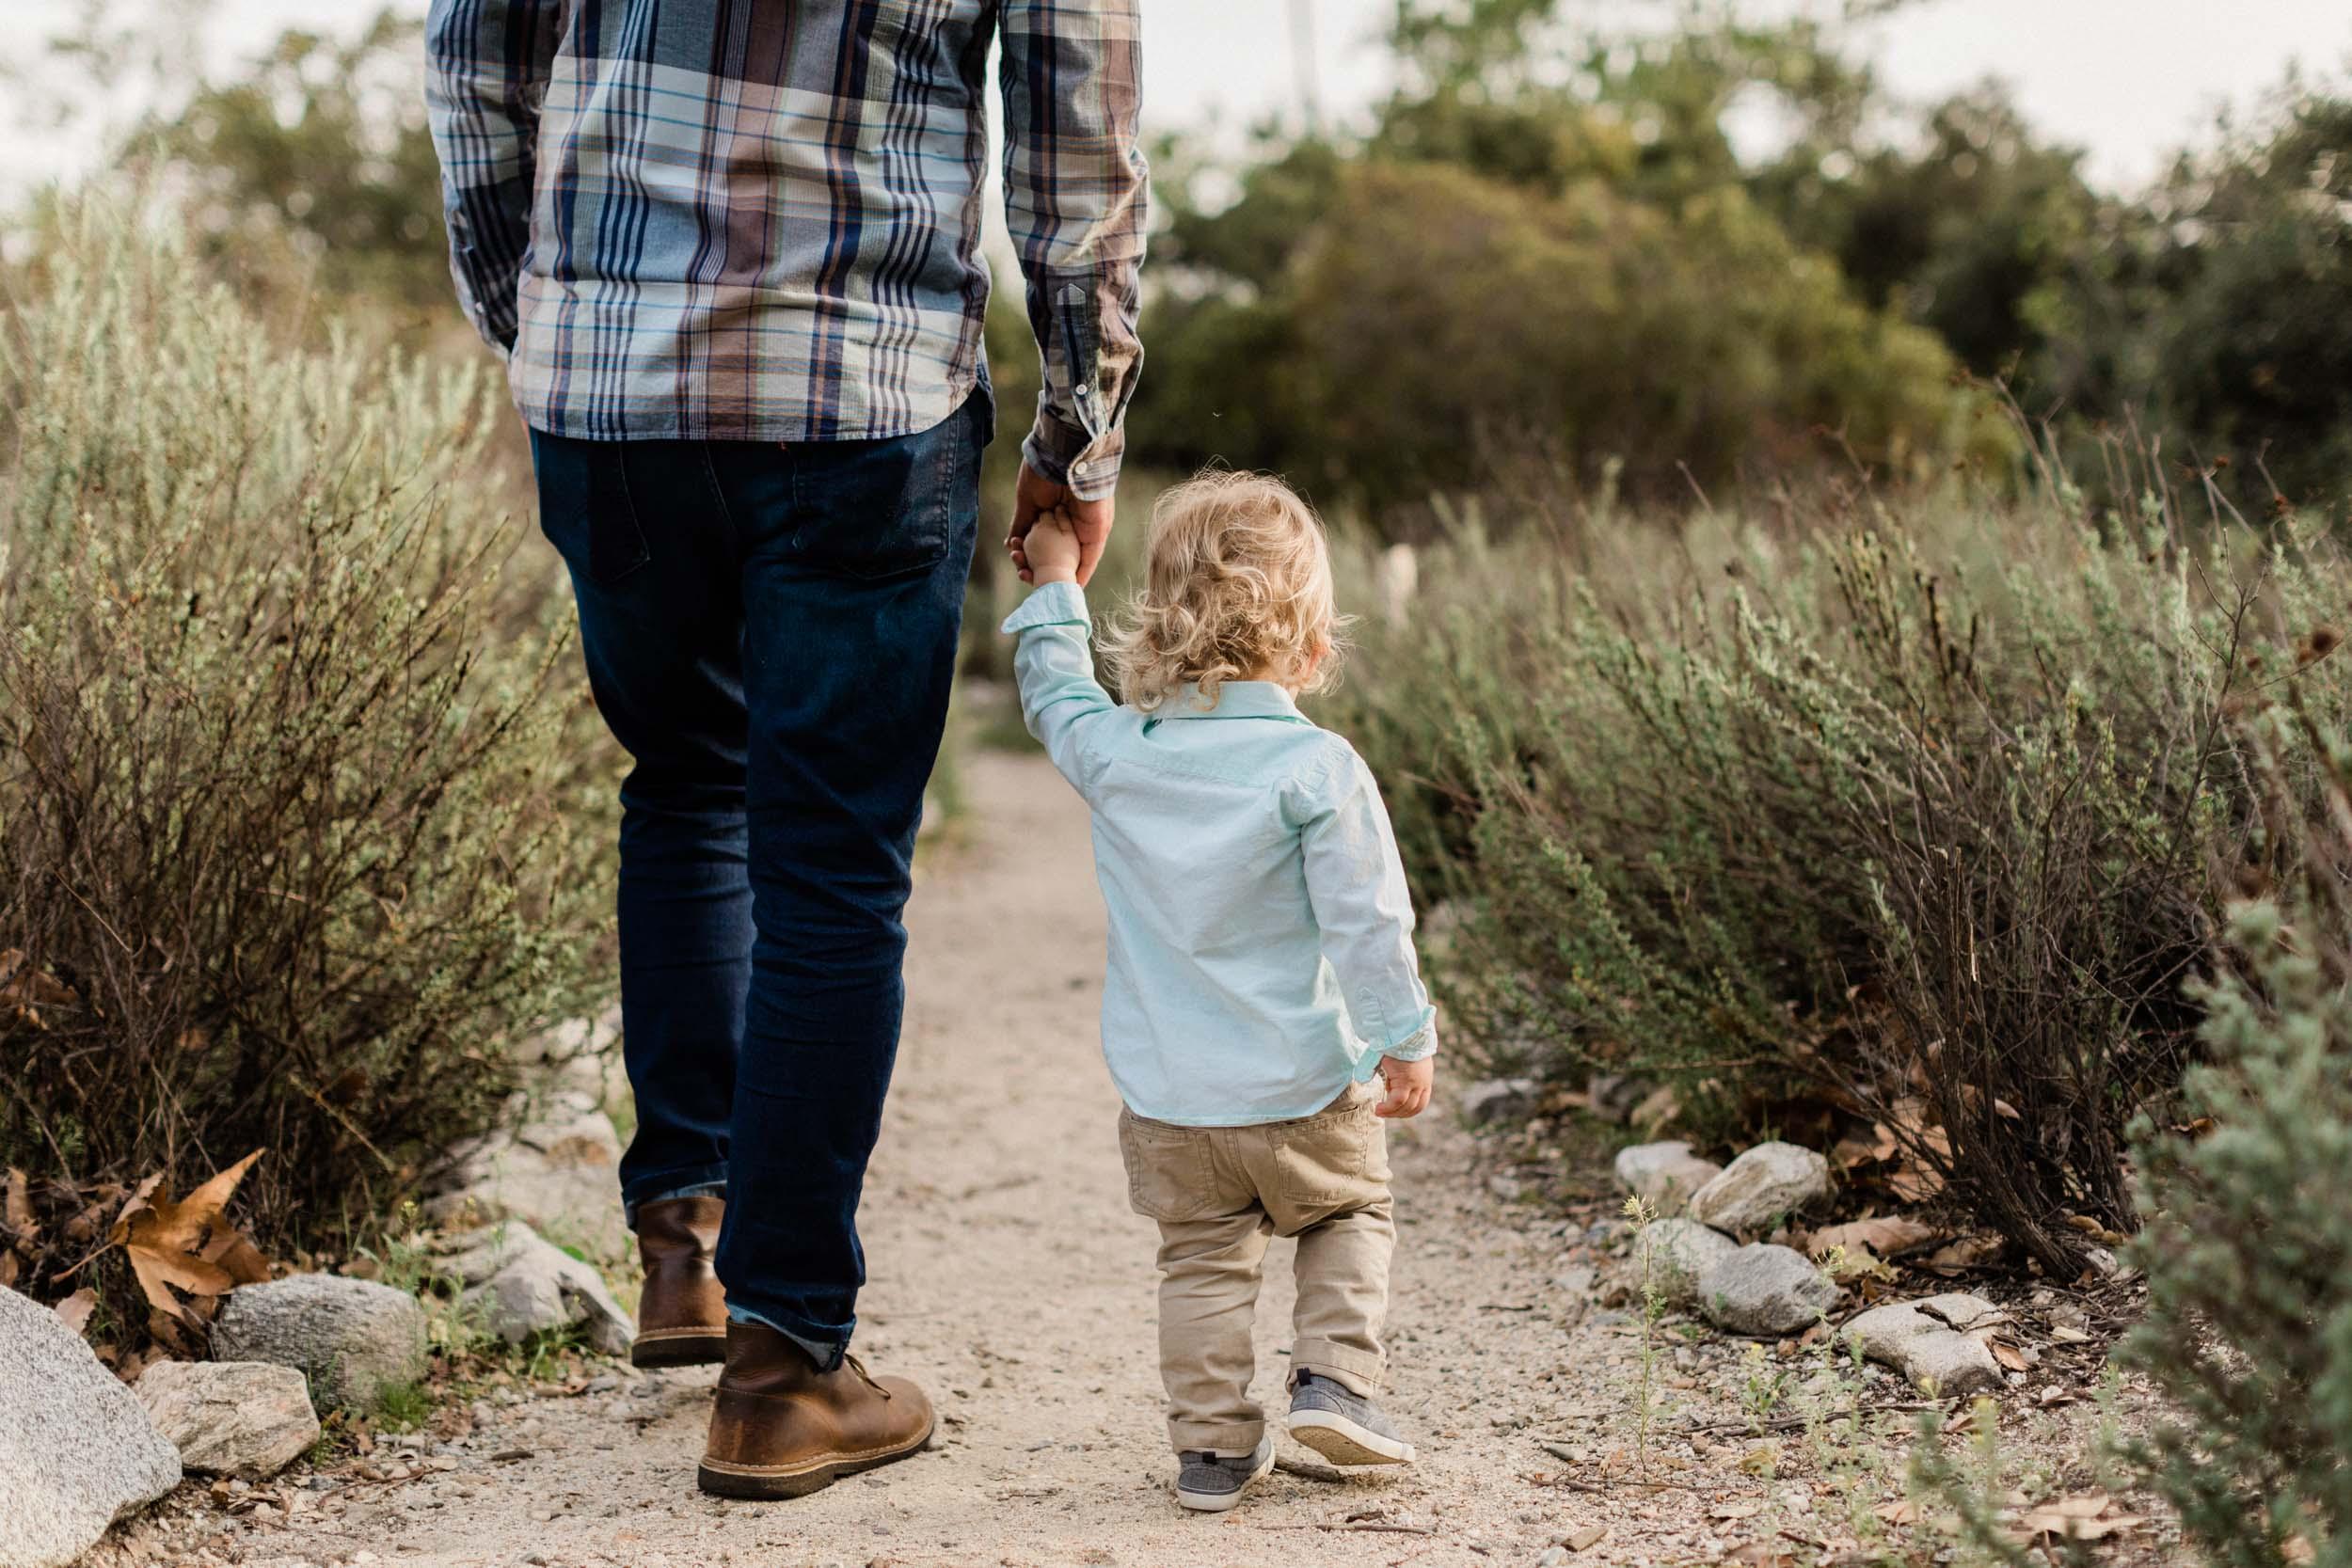 BKM-Photography-Pasadena-Los-Angeles-Family-Photographer-Mini-Sessions-0001-17.jpg